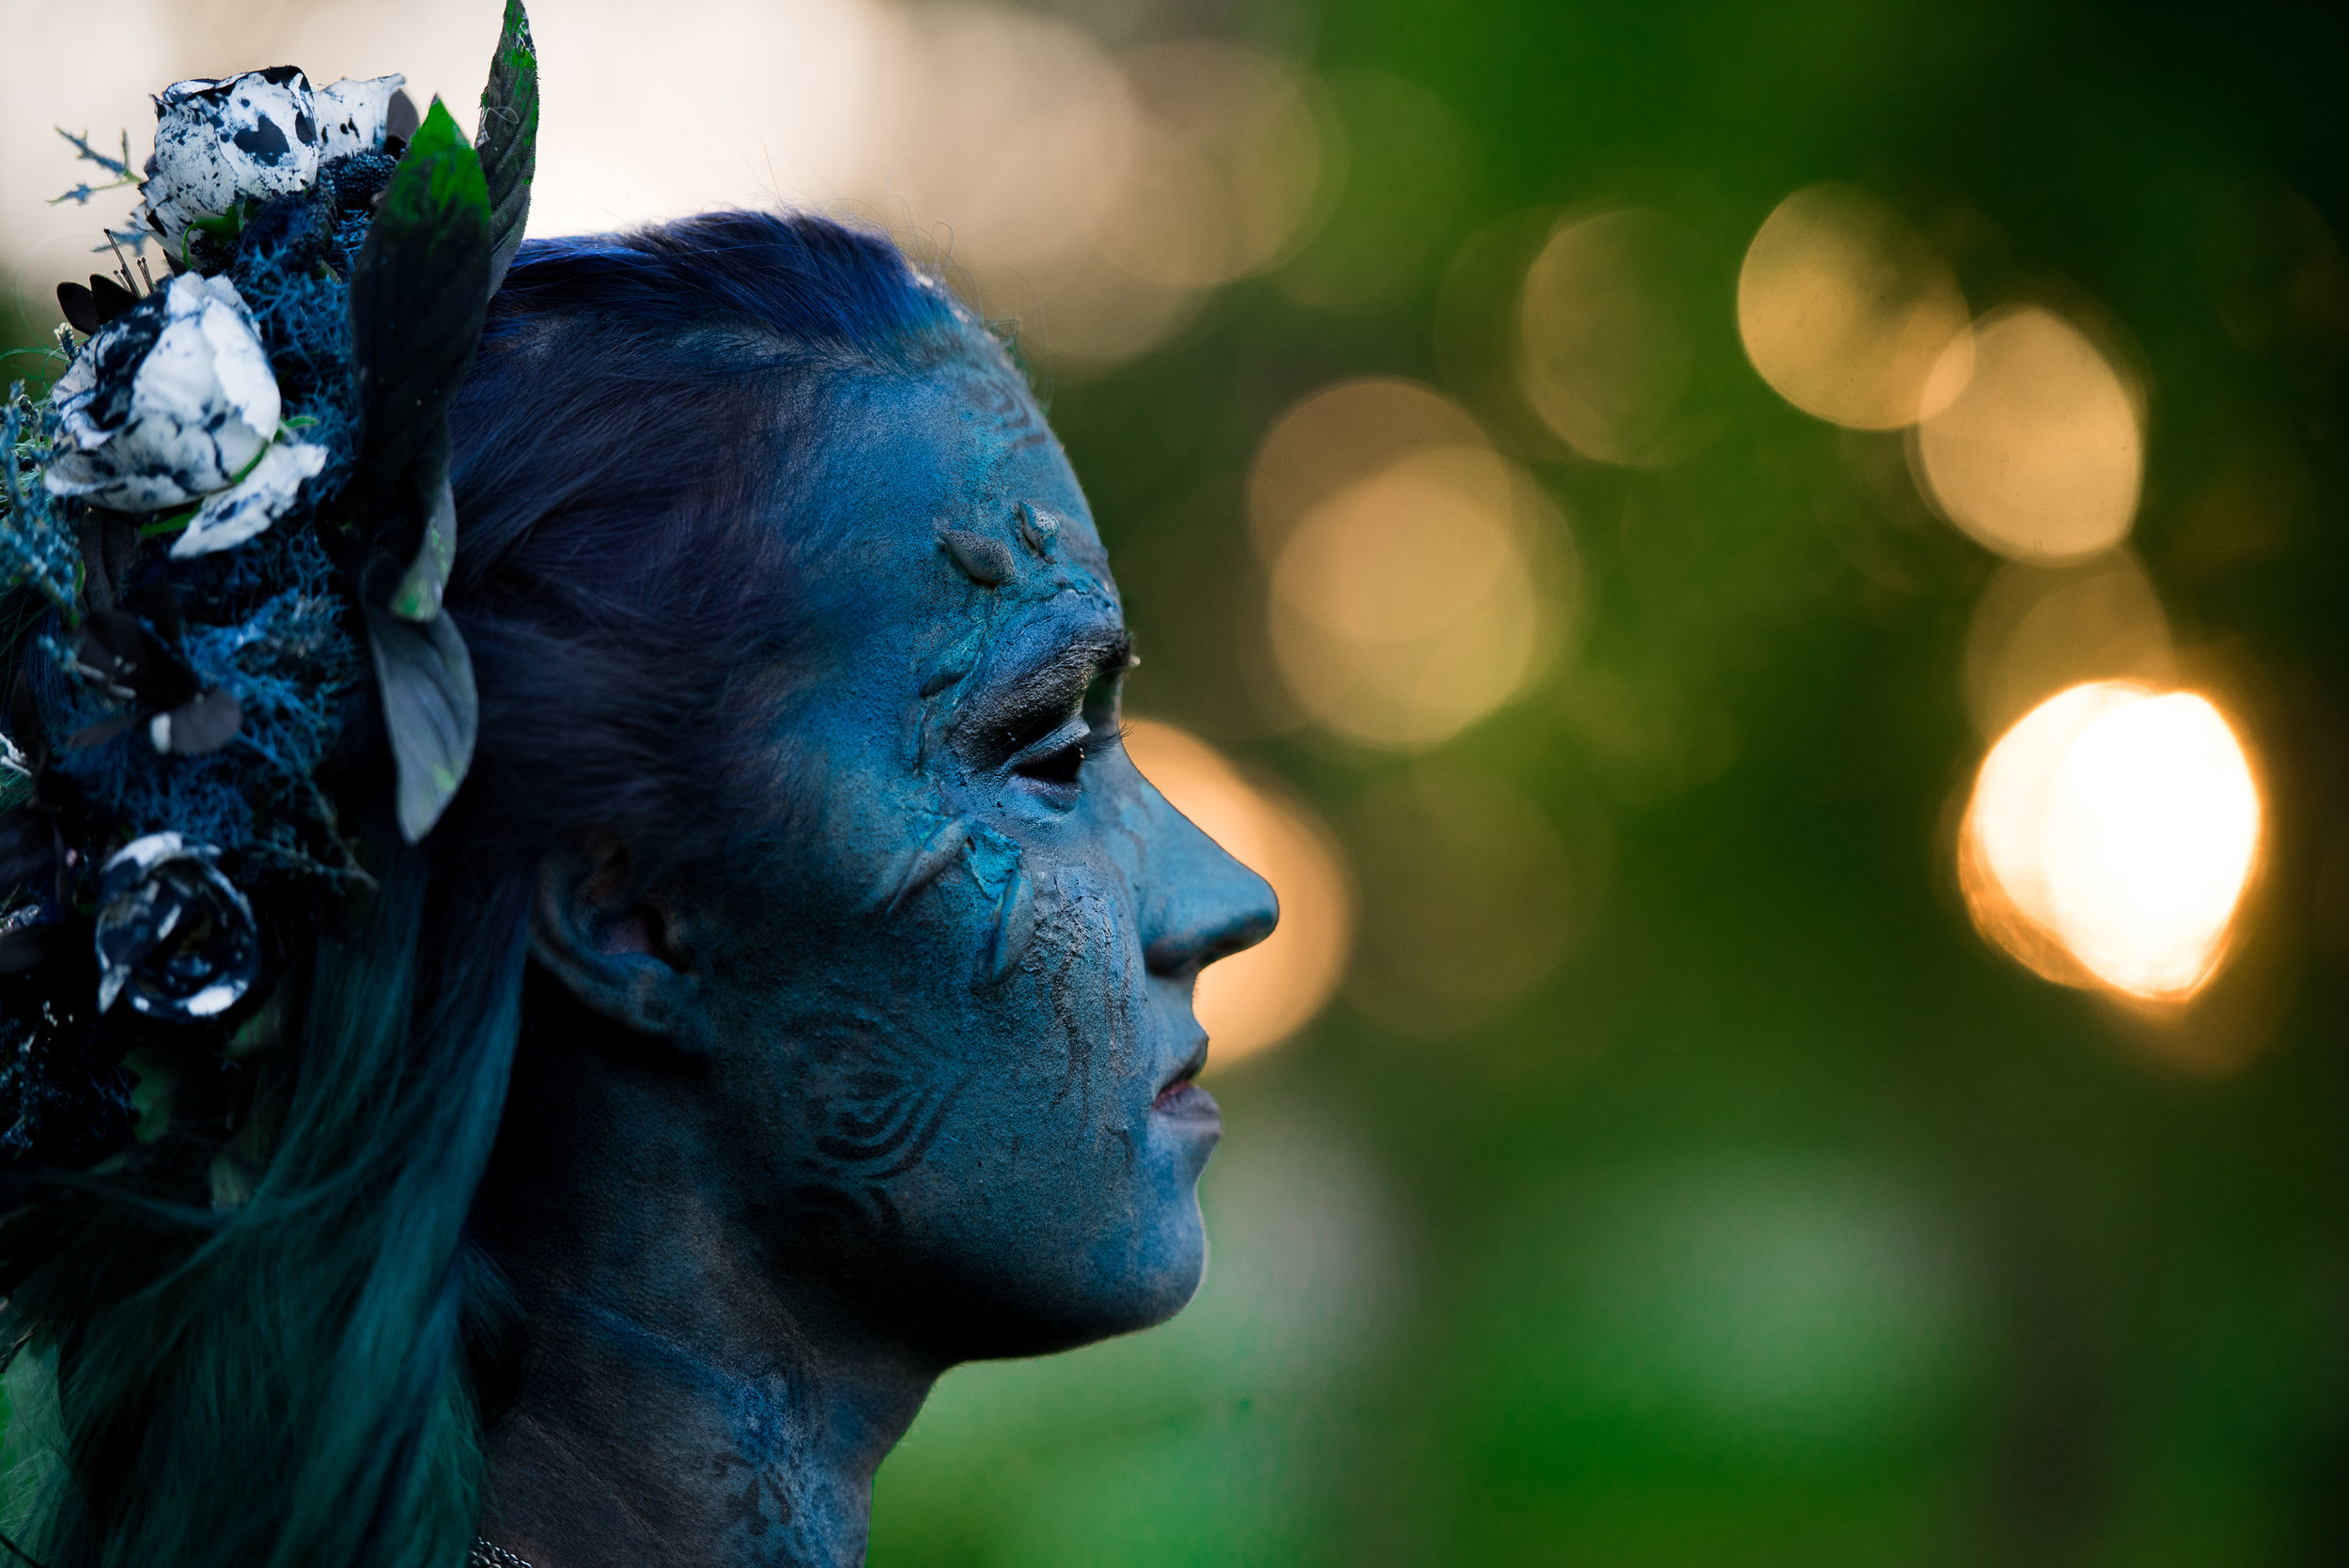 Austin Texas SFX Artist Collaboration Cosplay Photography Badass Crayon Elves Fairy-32.JPG